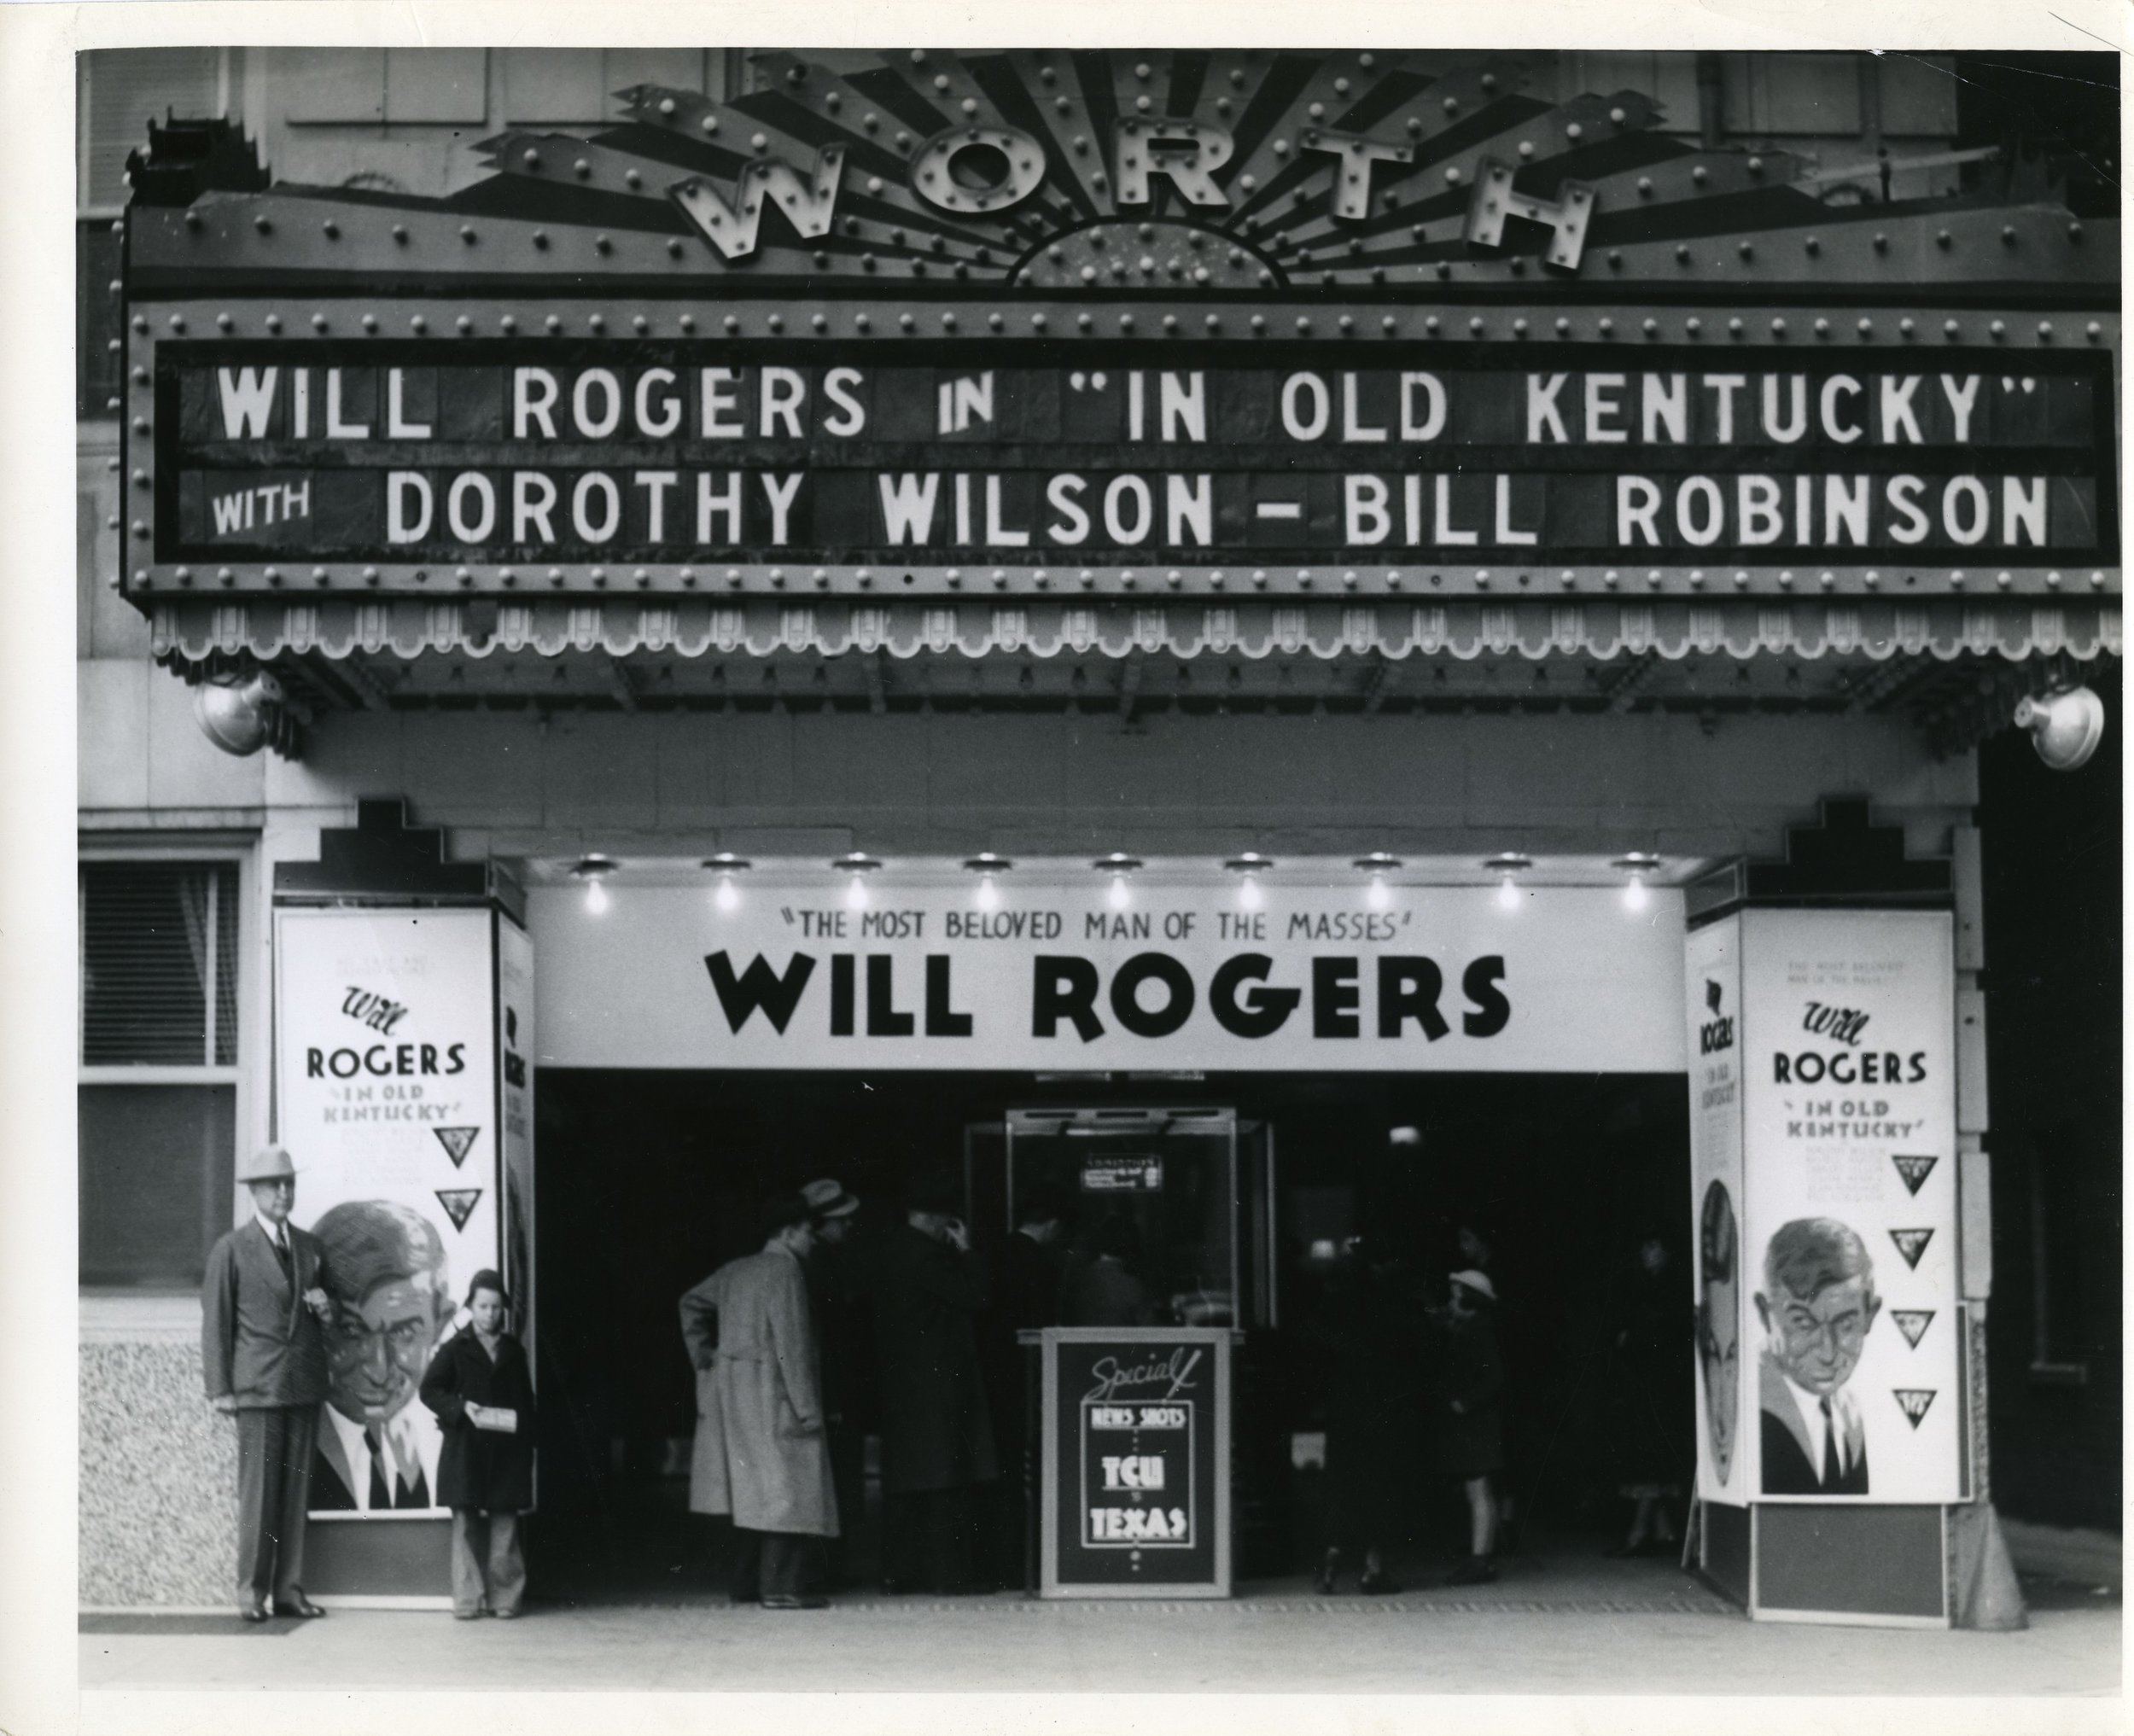 Rogers_Will_Folder_1_1928-1935_001.jpg